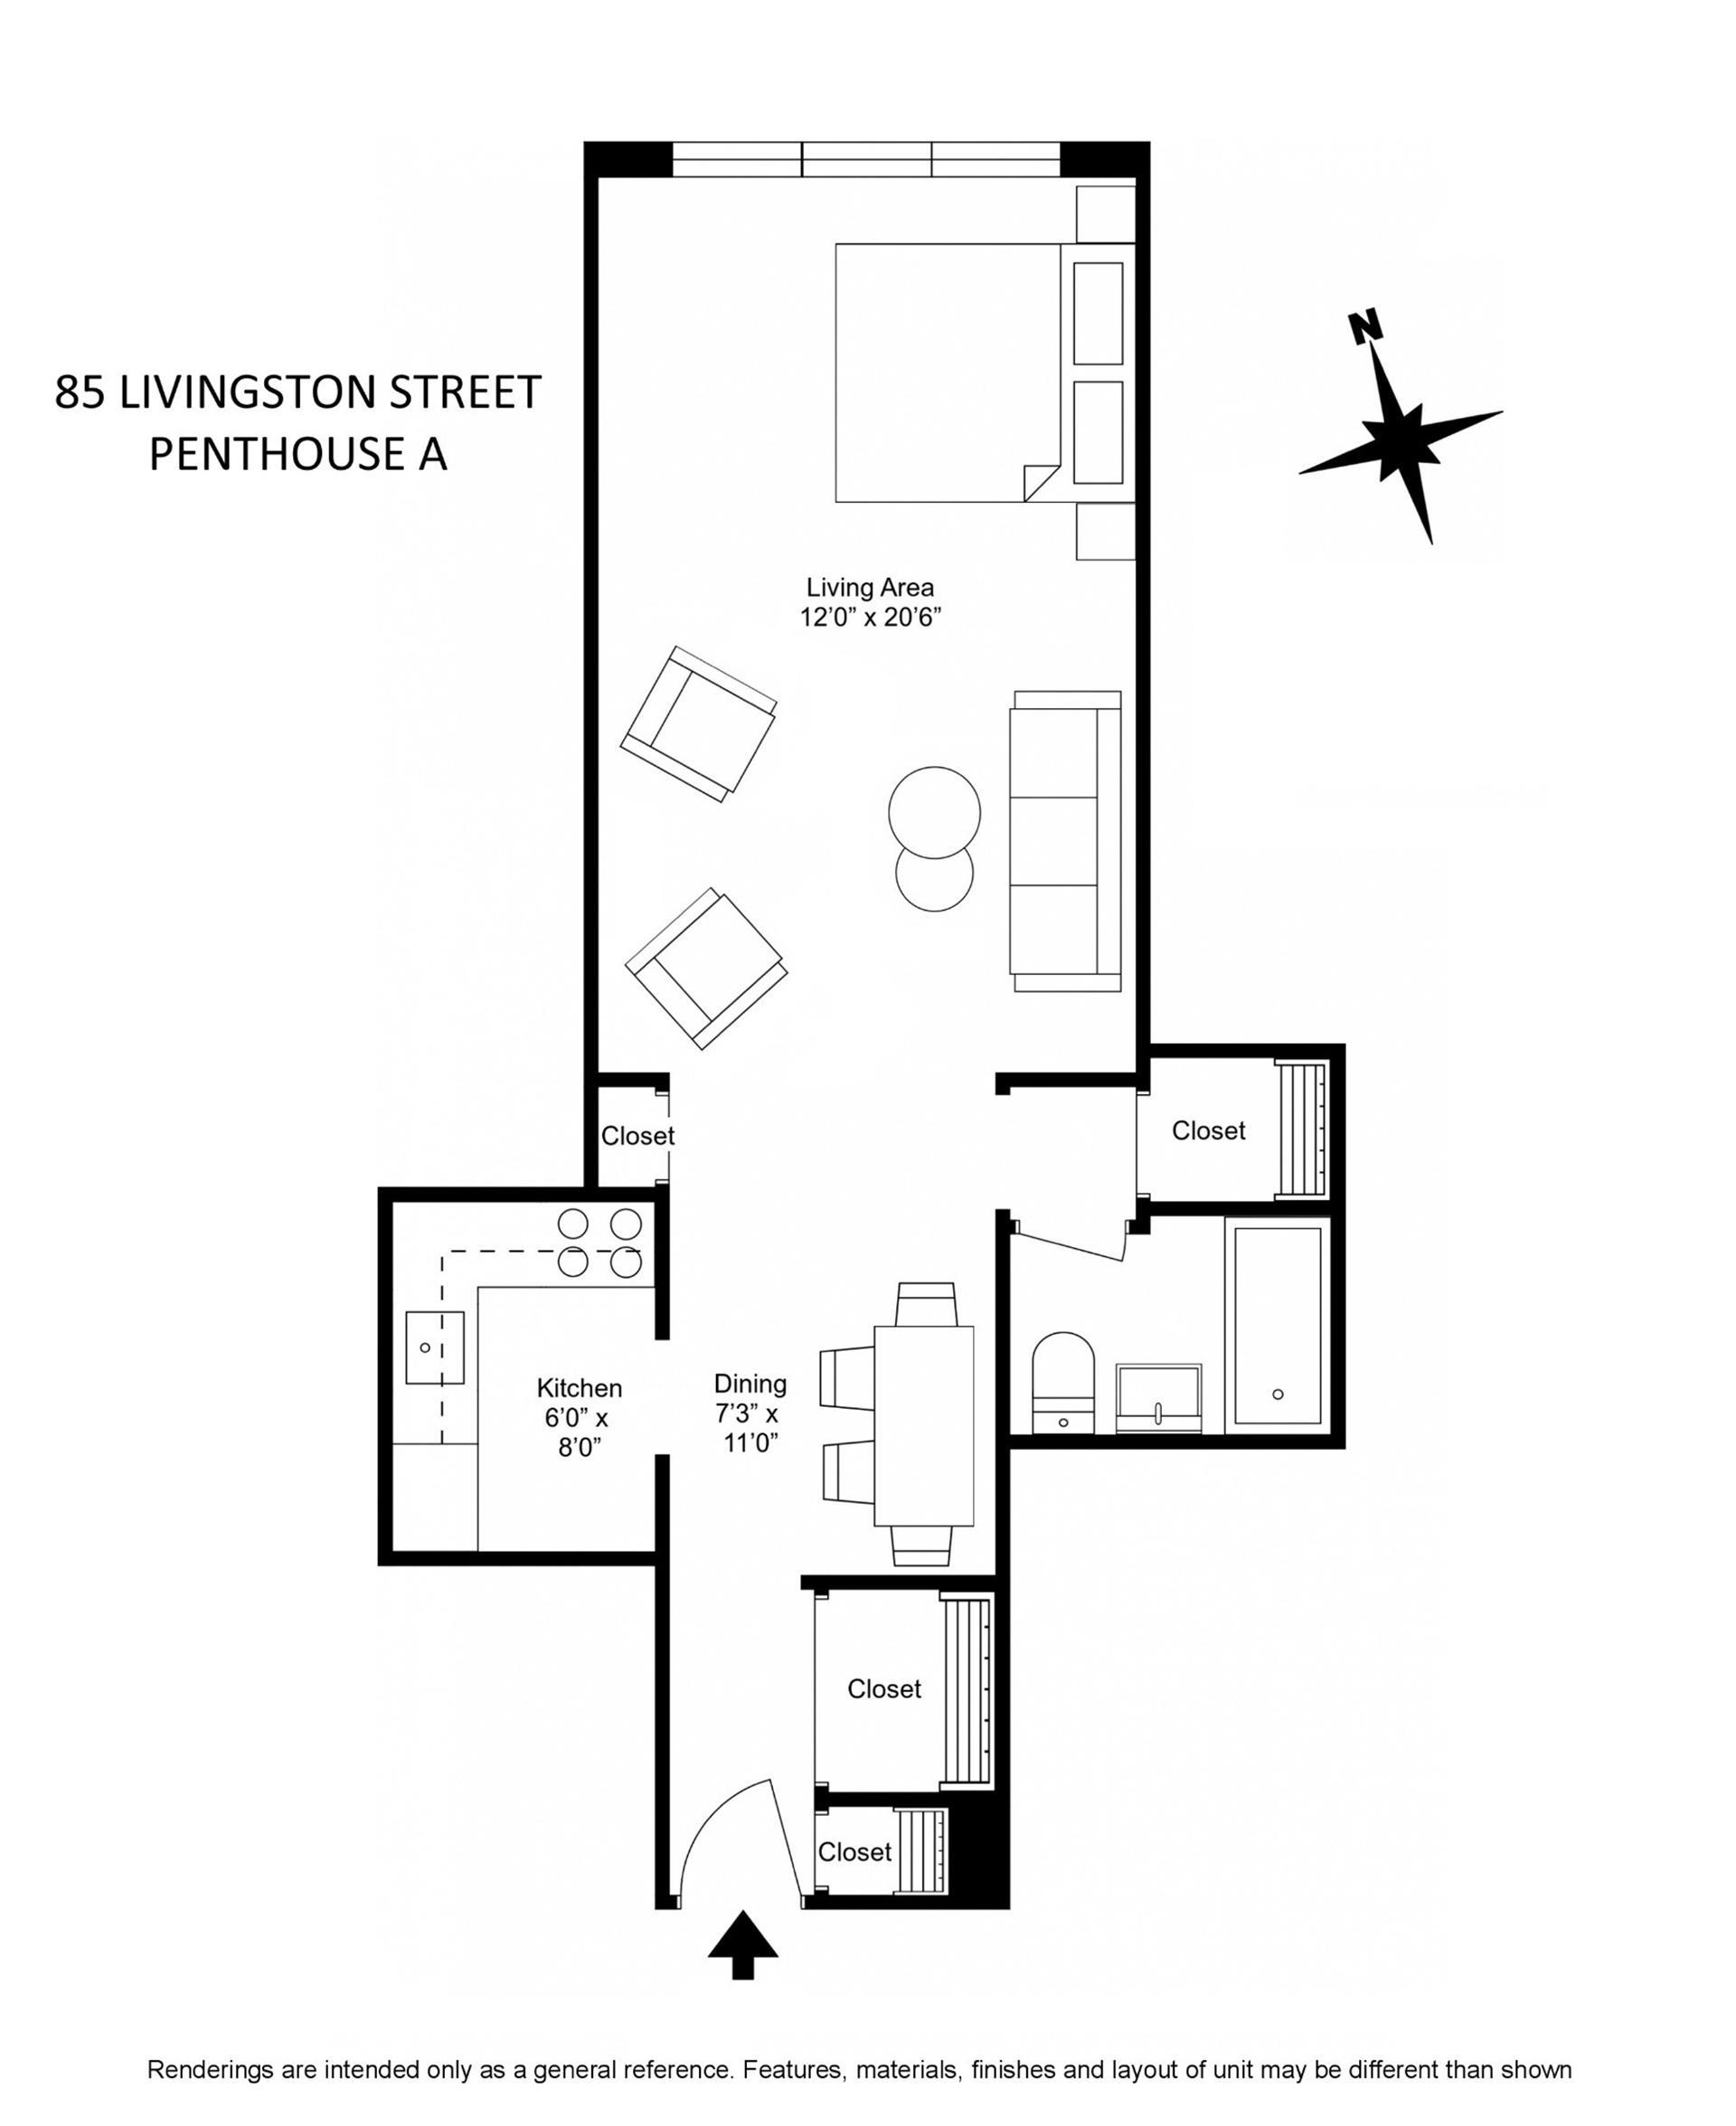 Floor plan of 85 Livingston St, PHA - Brooklyn Heights, New York